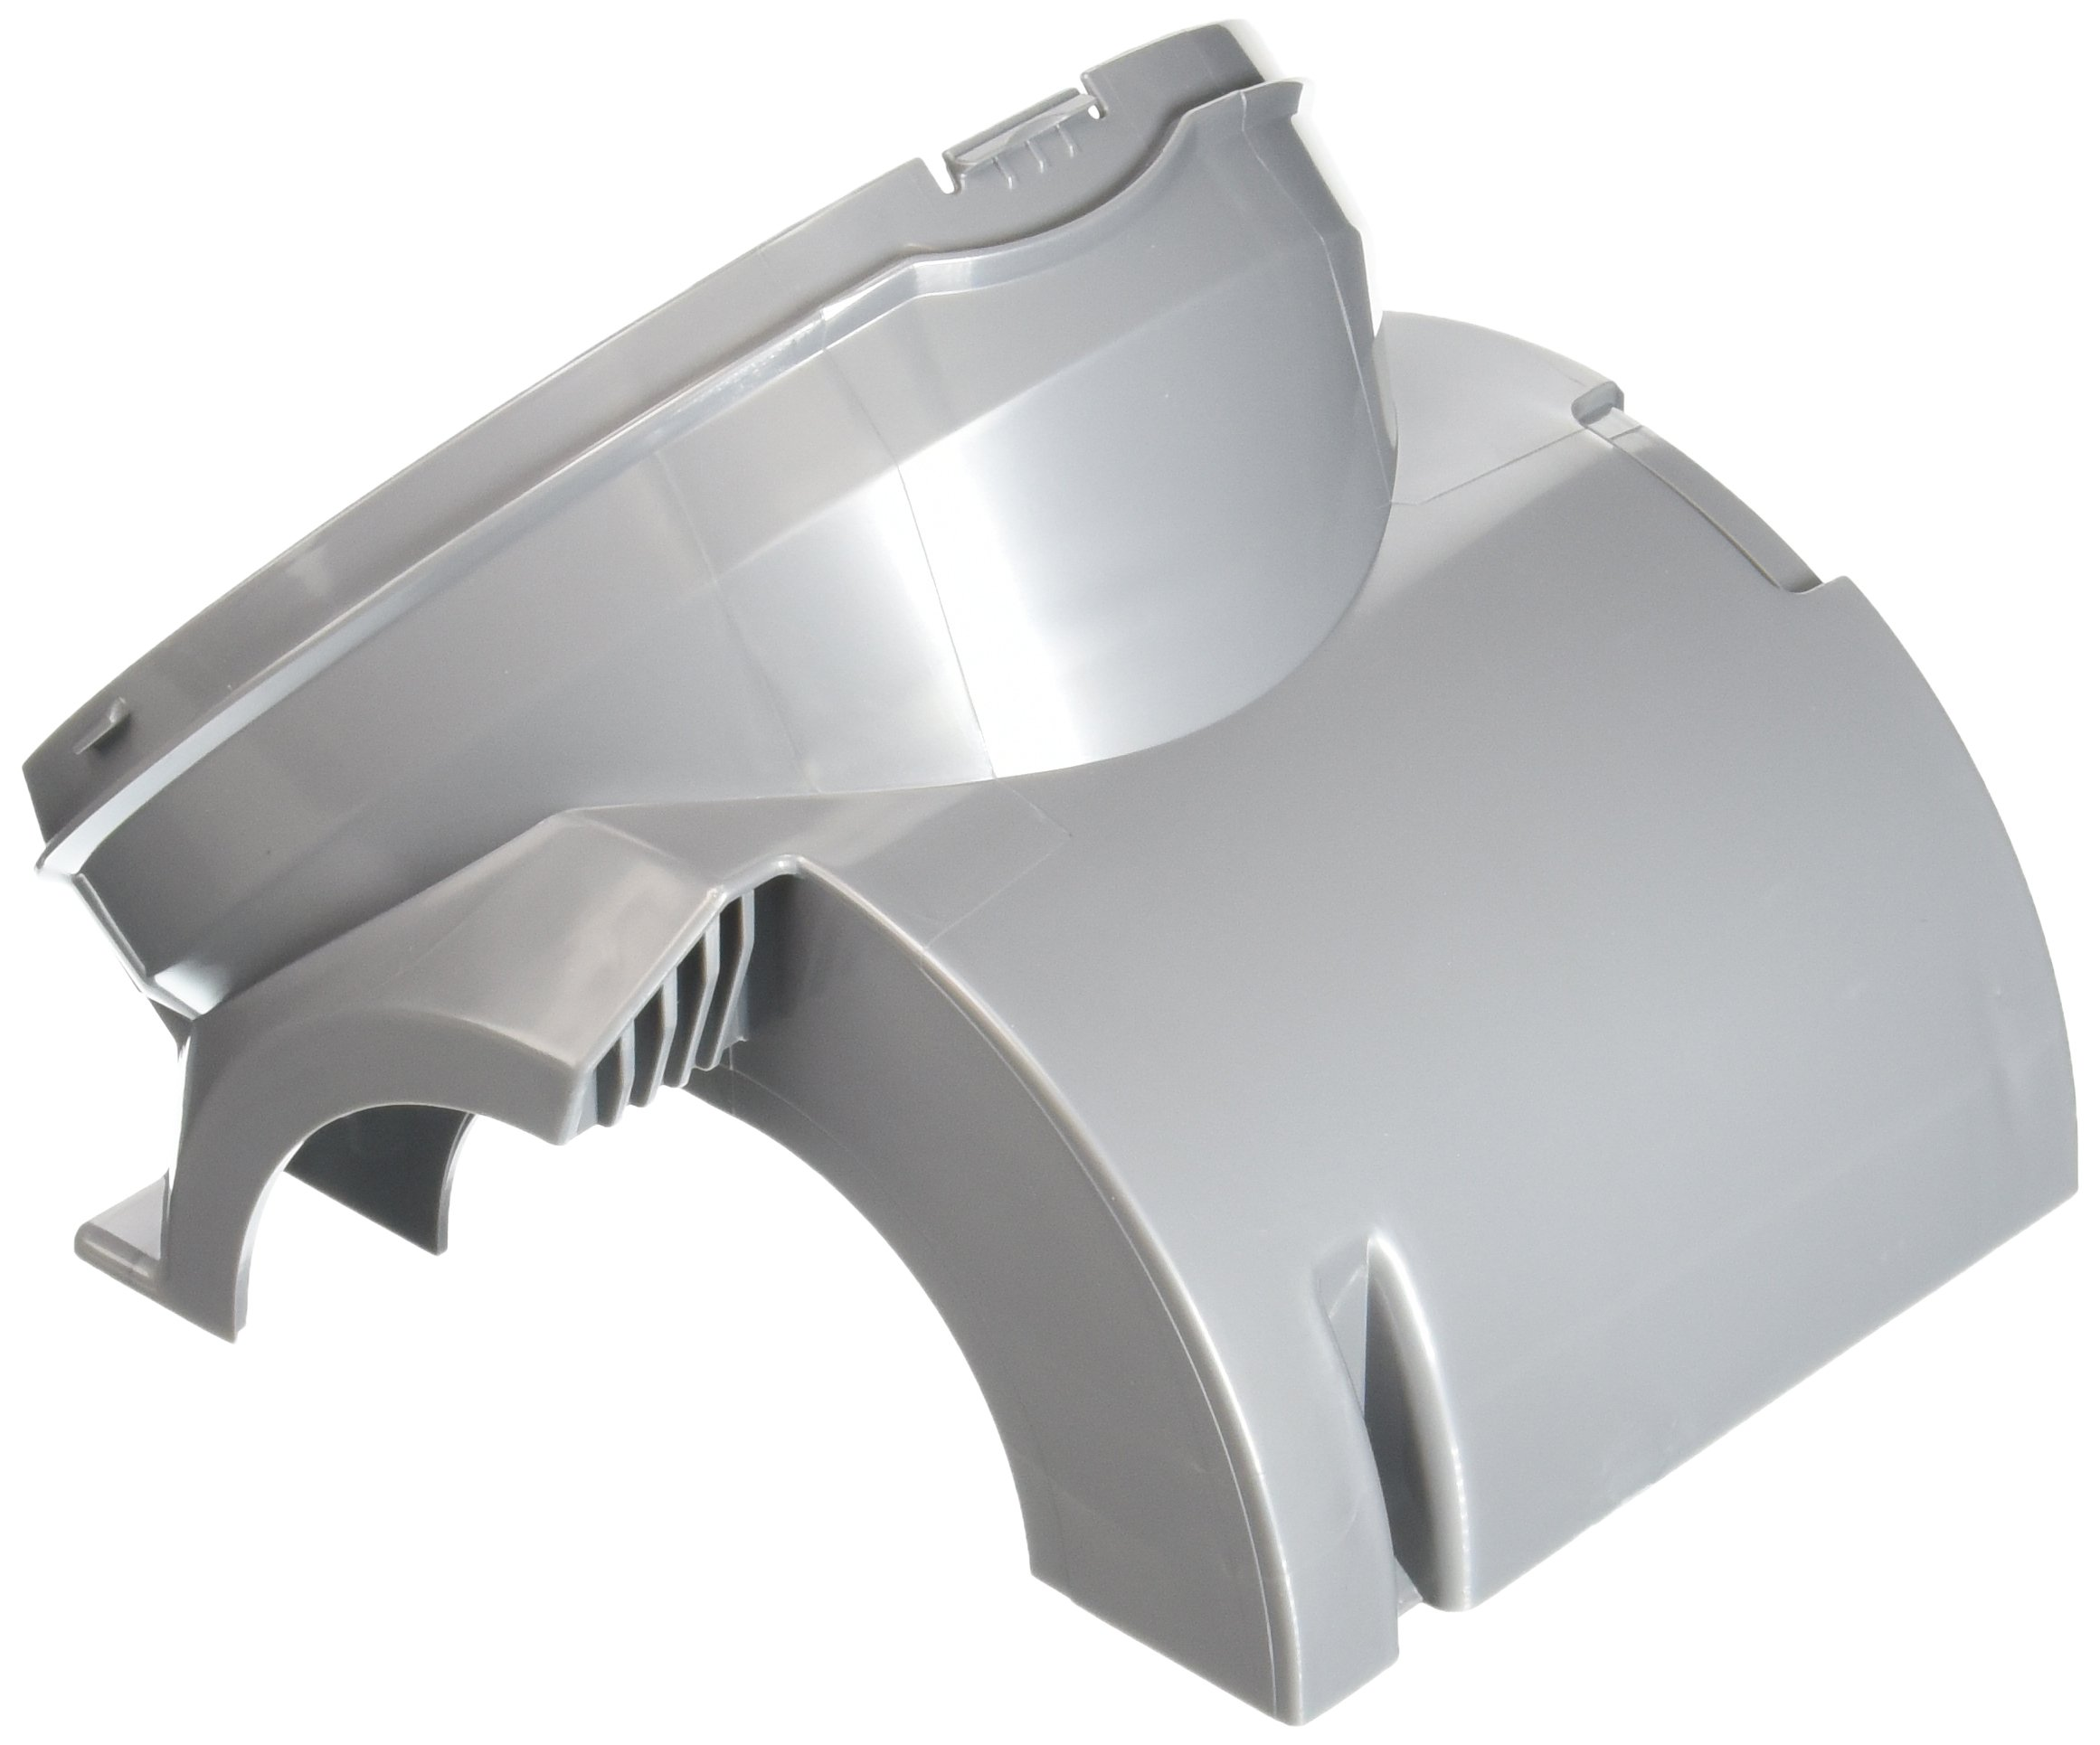 Dyson Upper Motor Cover, Dc14